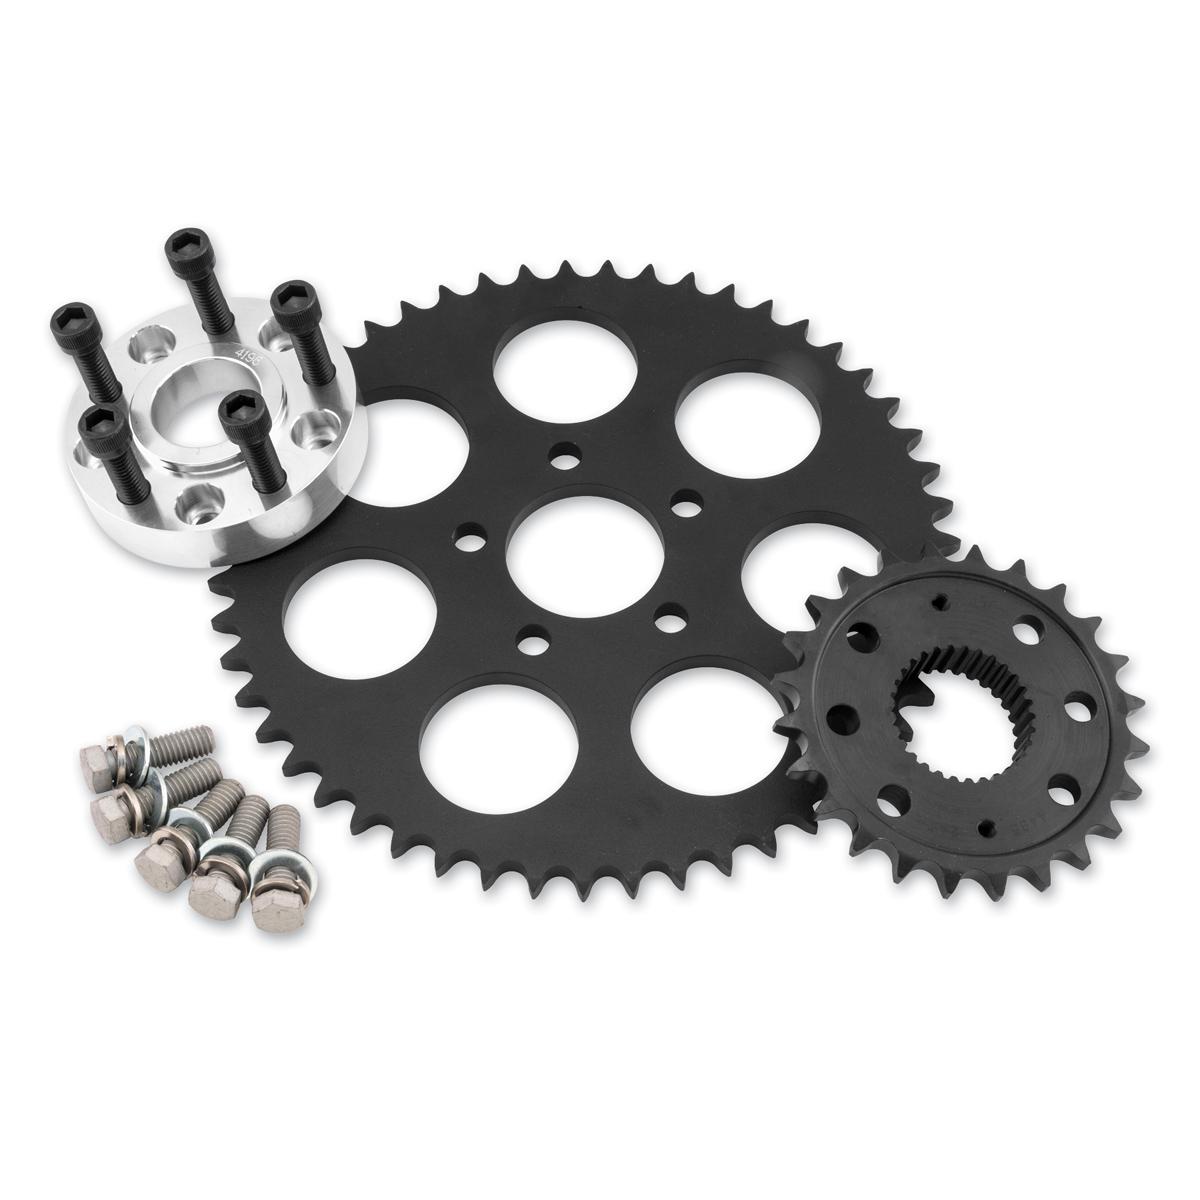 Twin Power Chain Conversion Kit 22T/48T